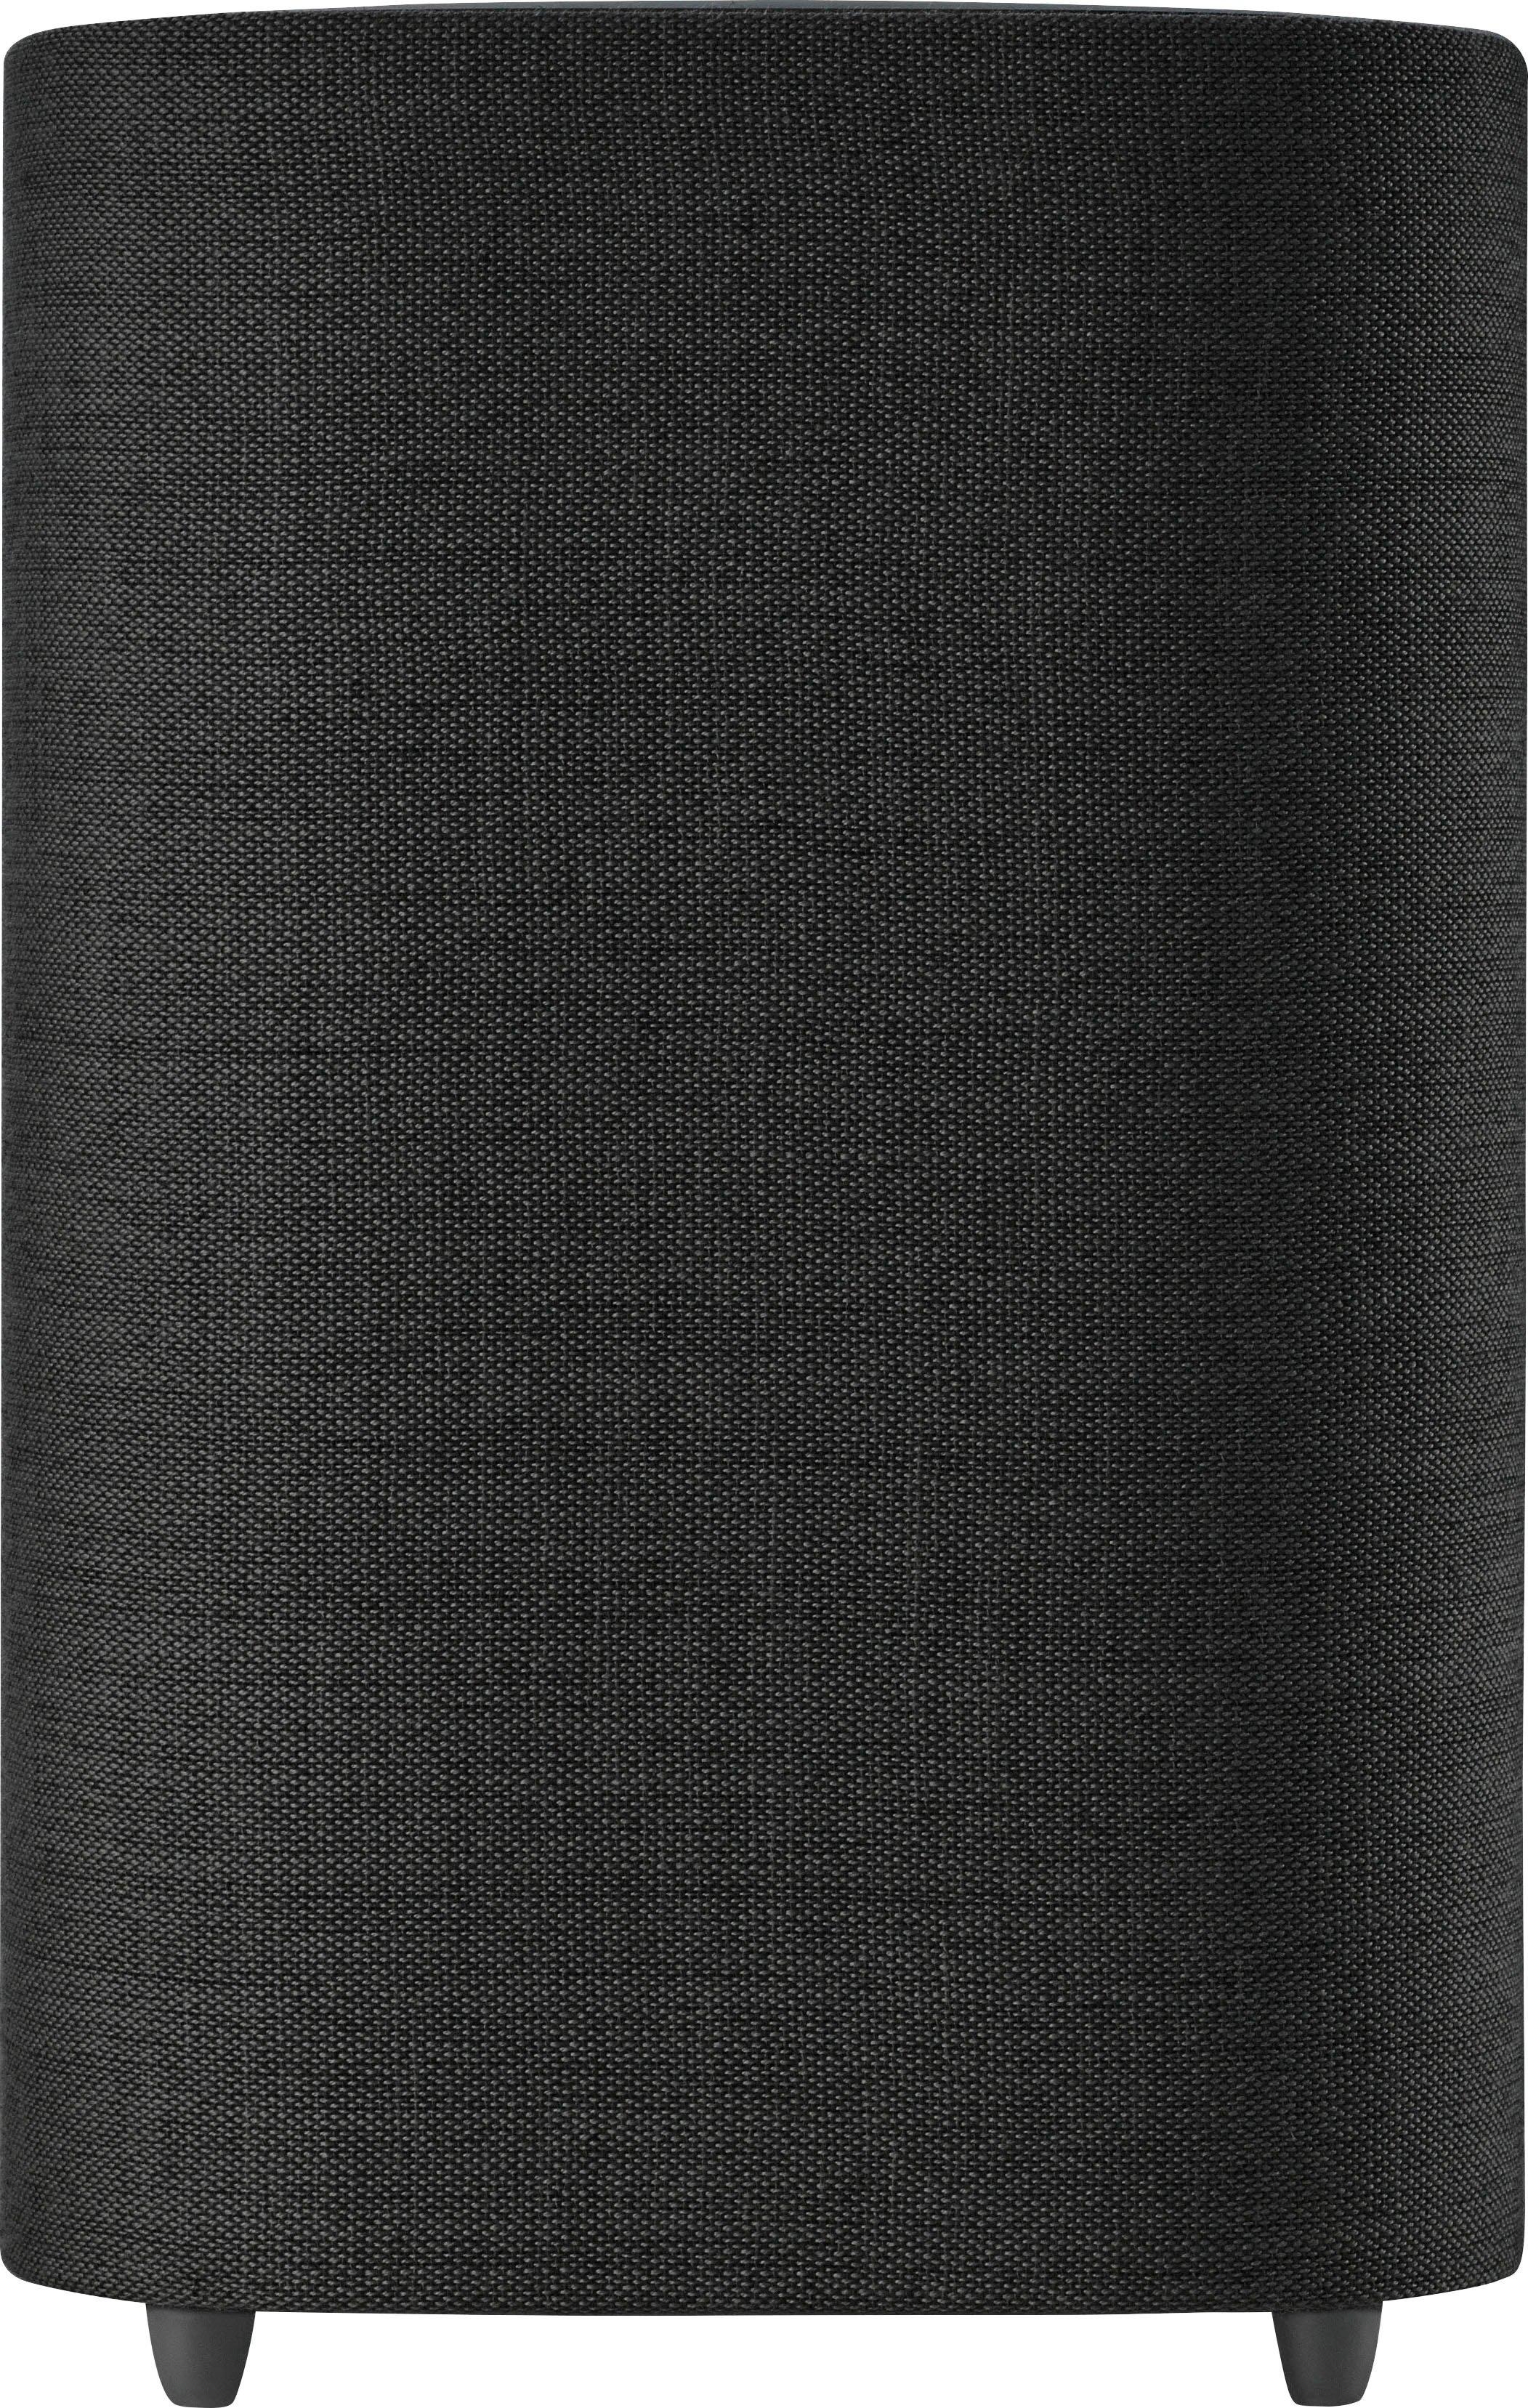 Harman/Kardon subwoofer Citation Sub S voordelig en veilig online kopen